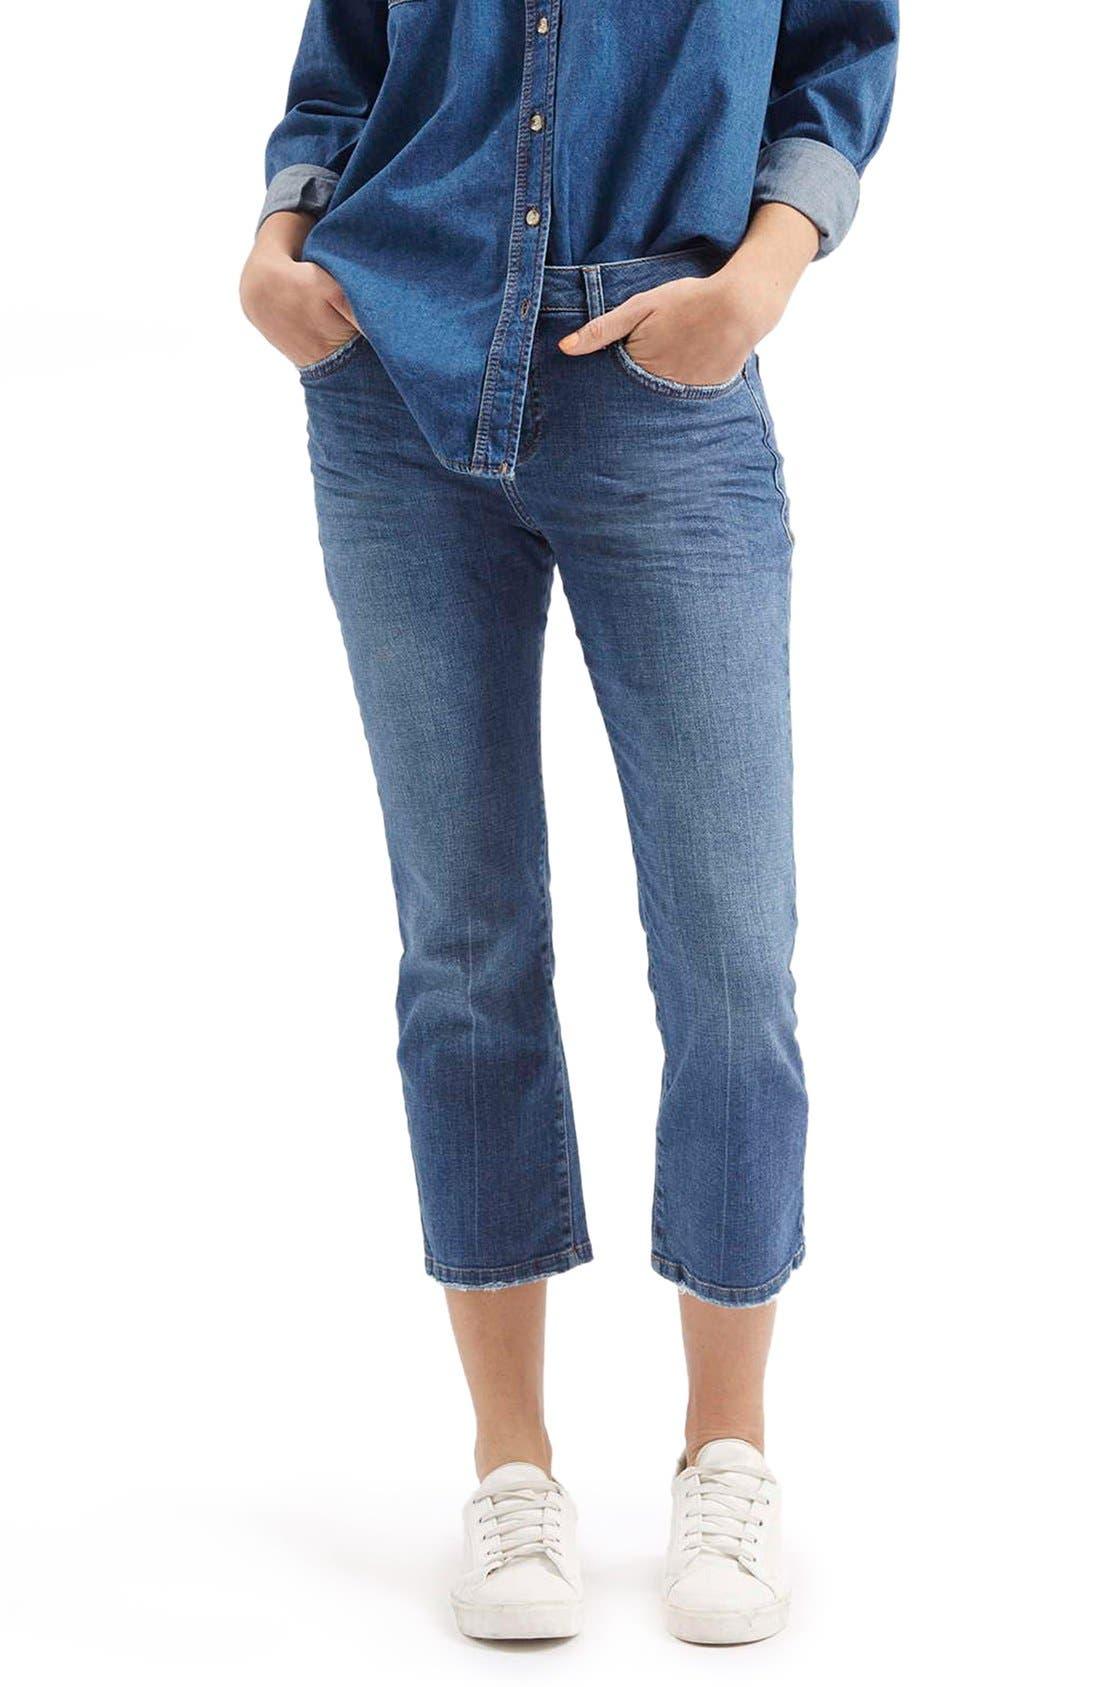 Alternate Image 1 Selected - TopshopFlared Crop Jeans (Mid Denim) (Petite)